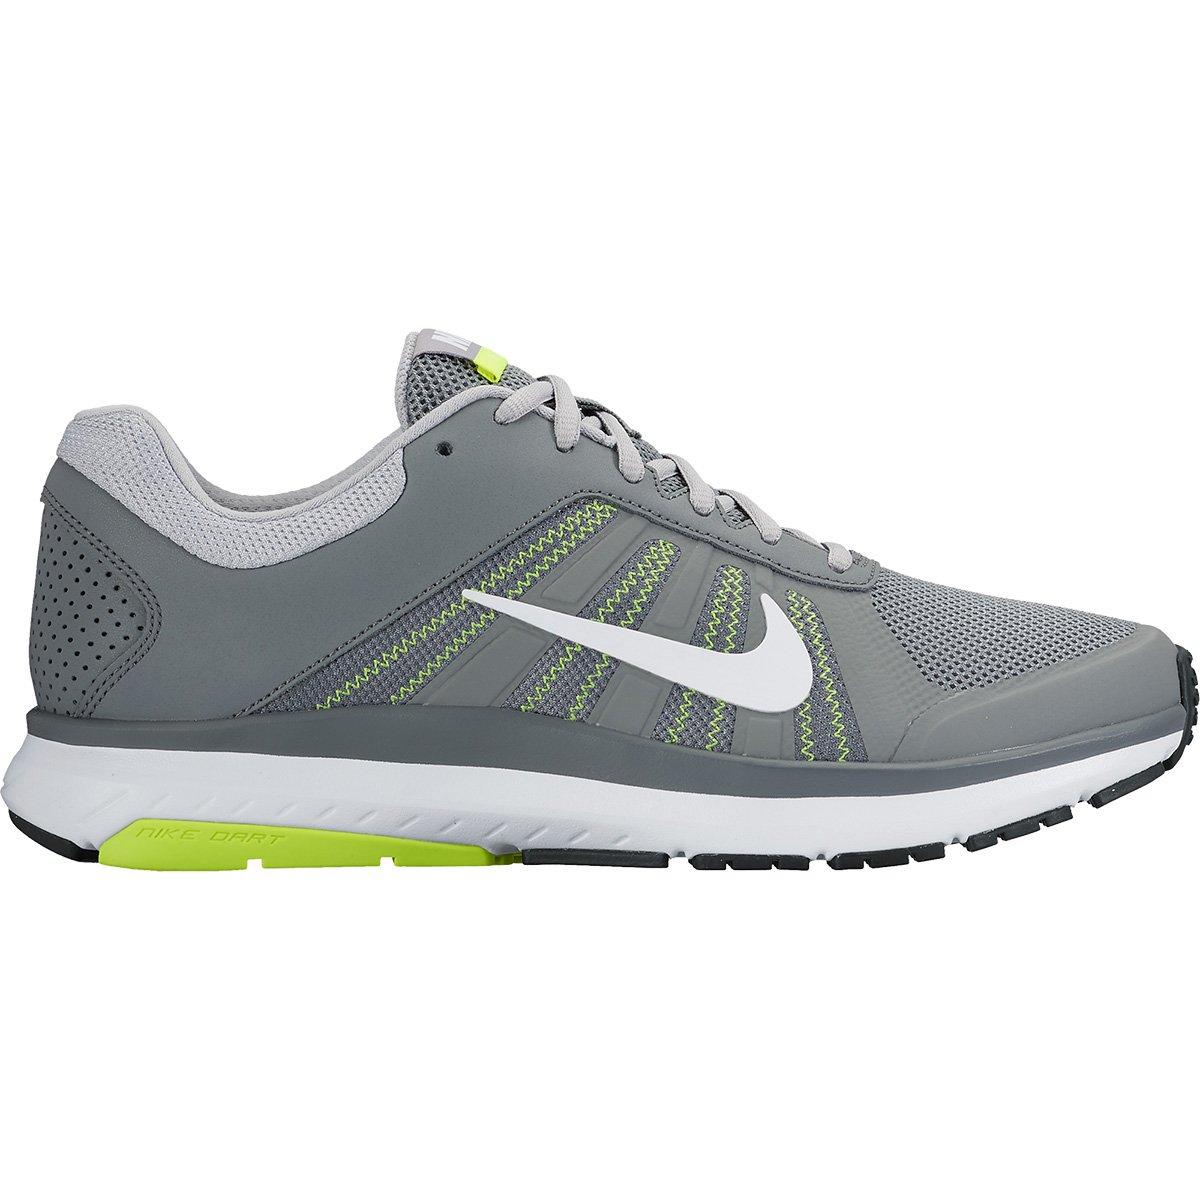 467a3b3c67e Tênis Nike Dart 12 MSL Masculino - Cinza e Branco - Compre Agora ...